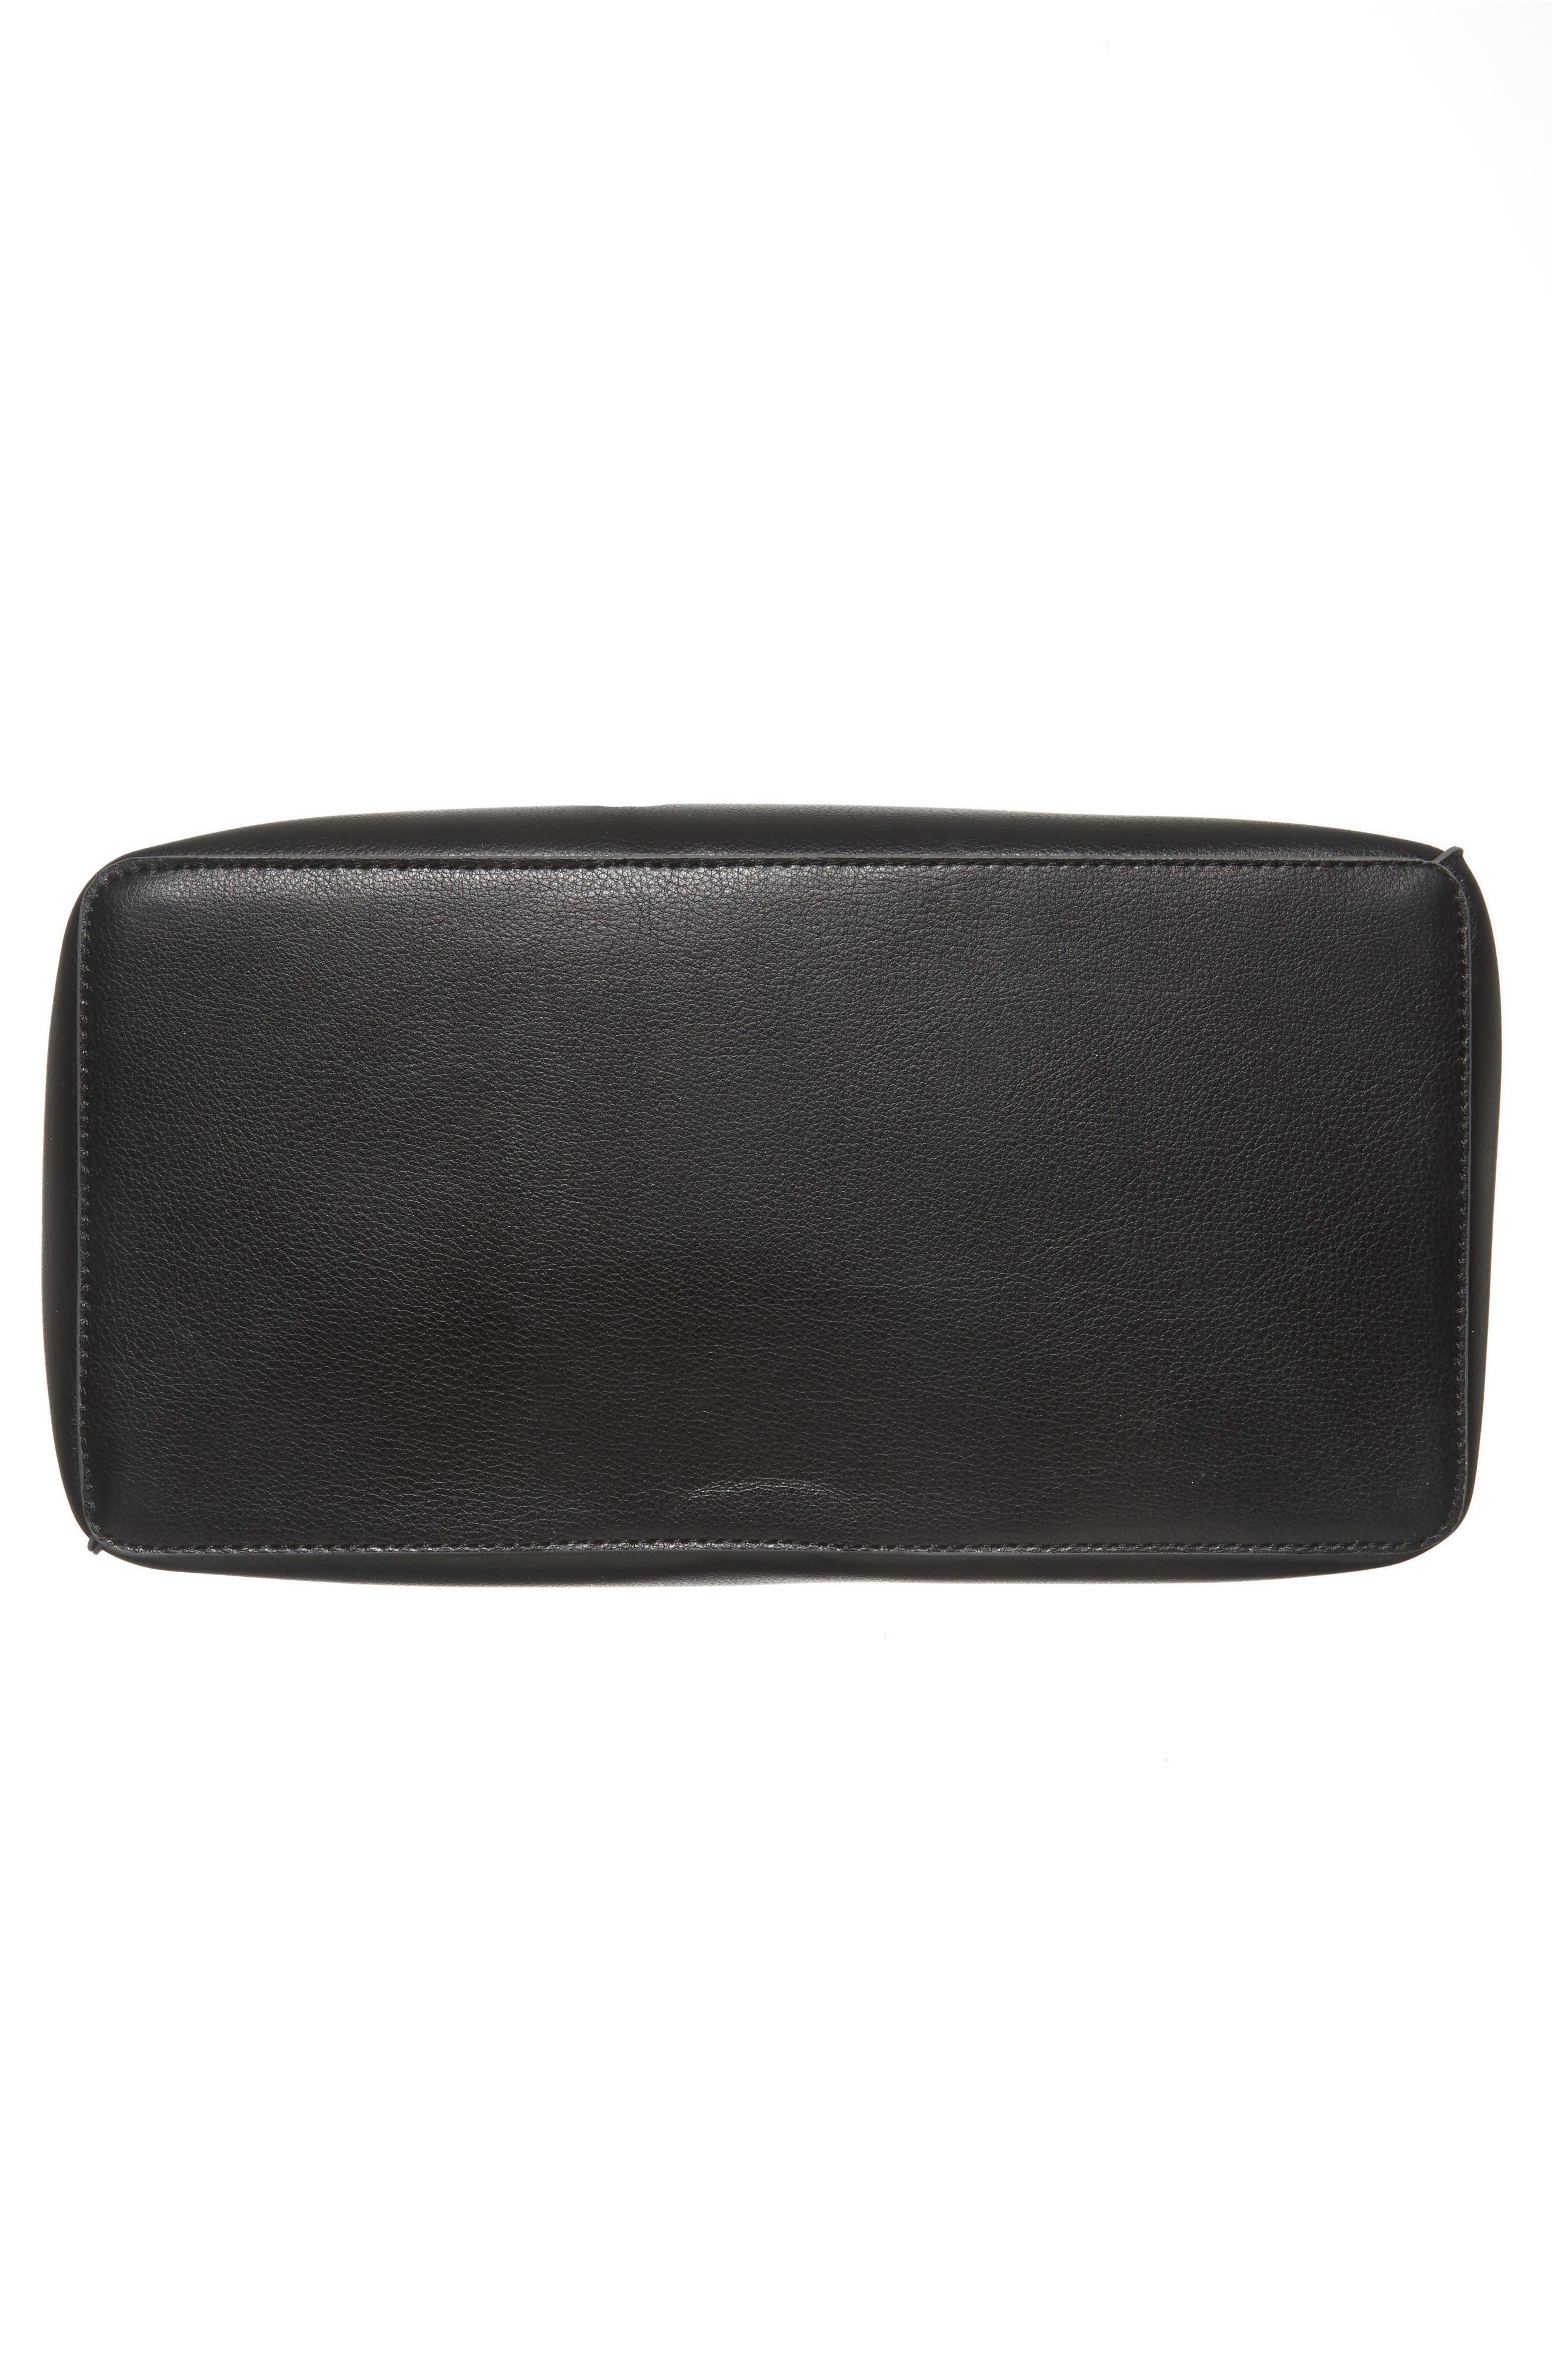 Prima Faux Leather Bucket Bag & Zip Pouch,                             Alternate thumbnail 6, color,                             001